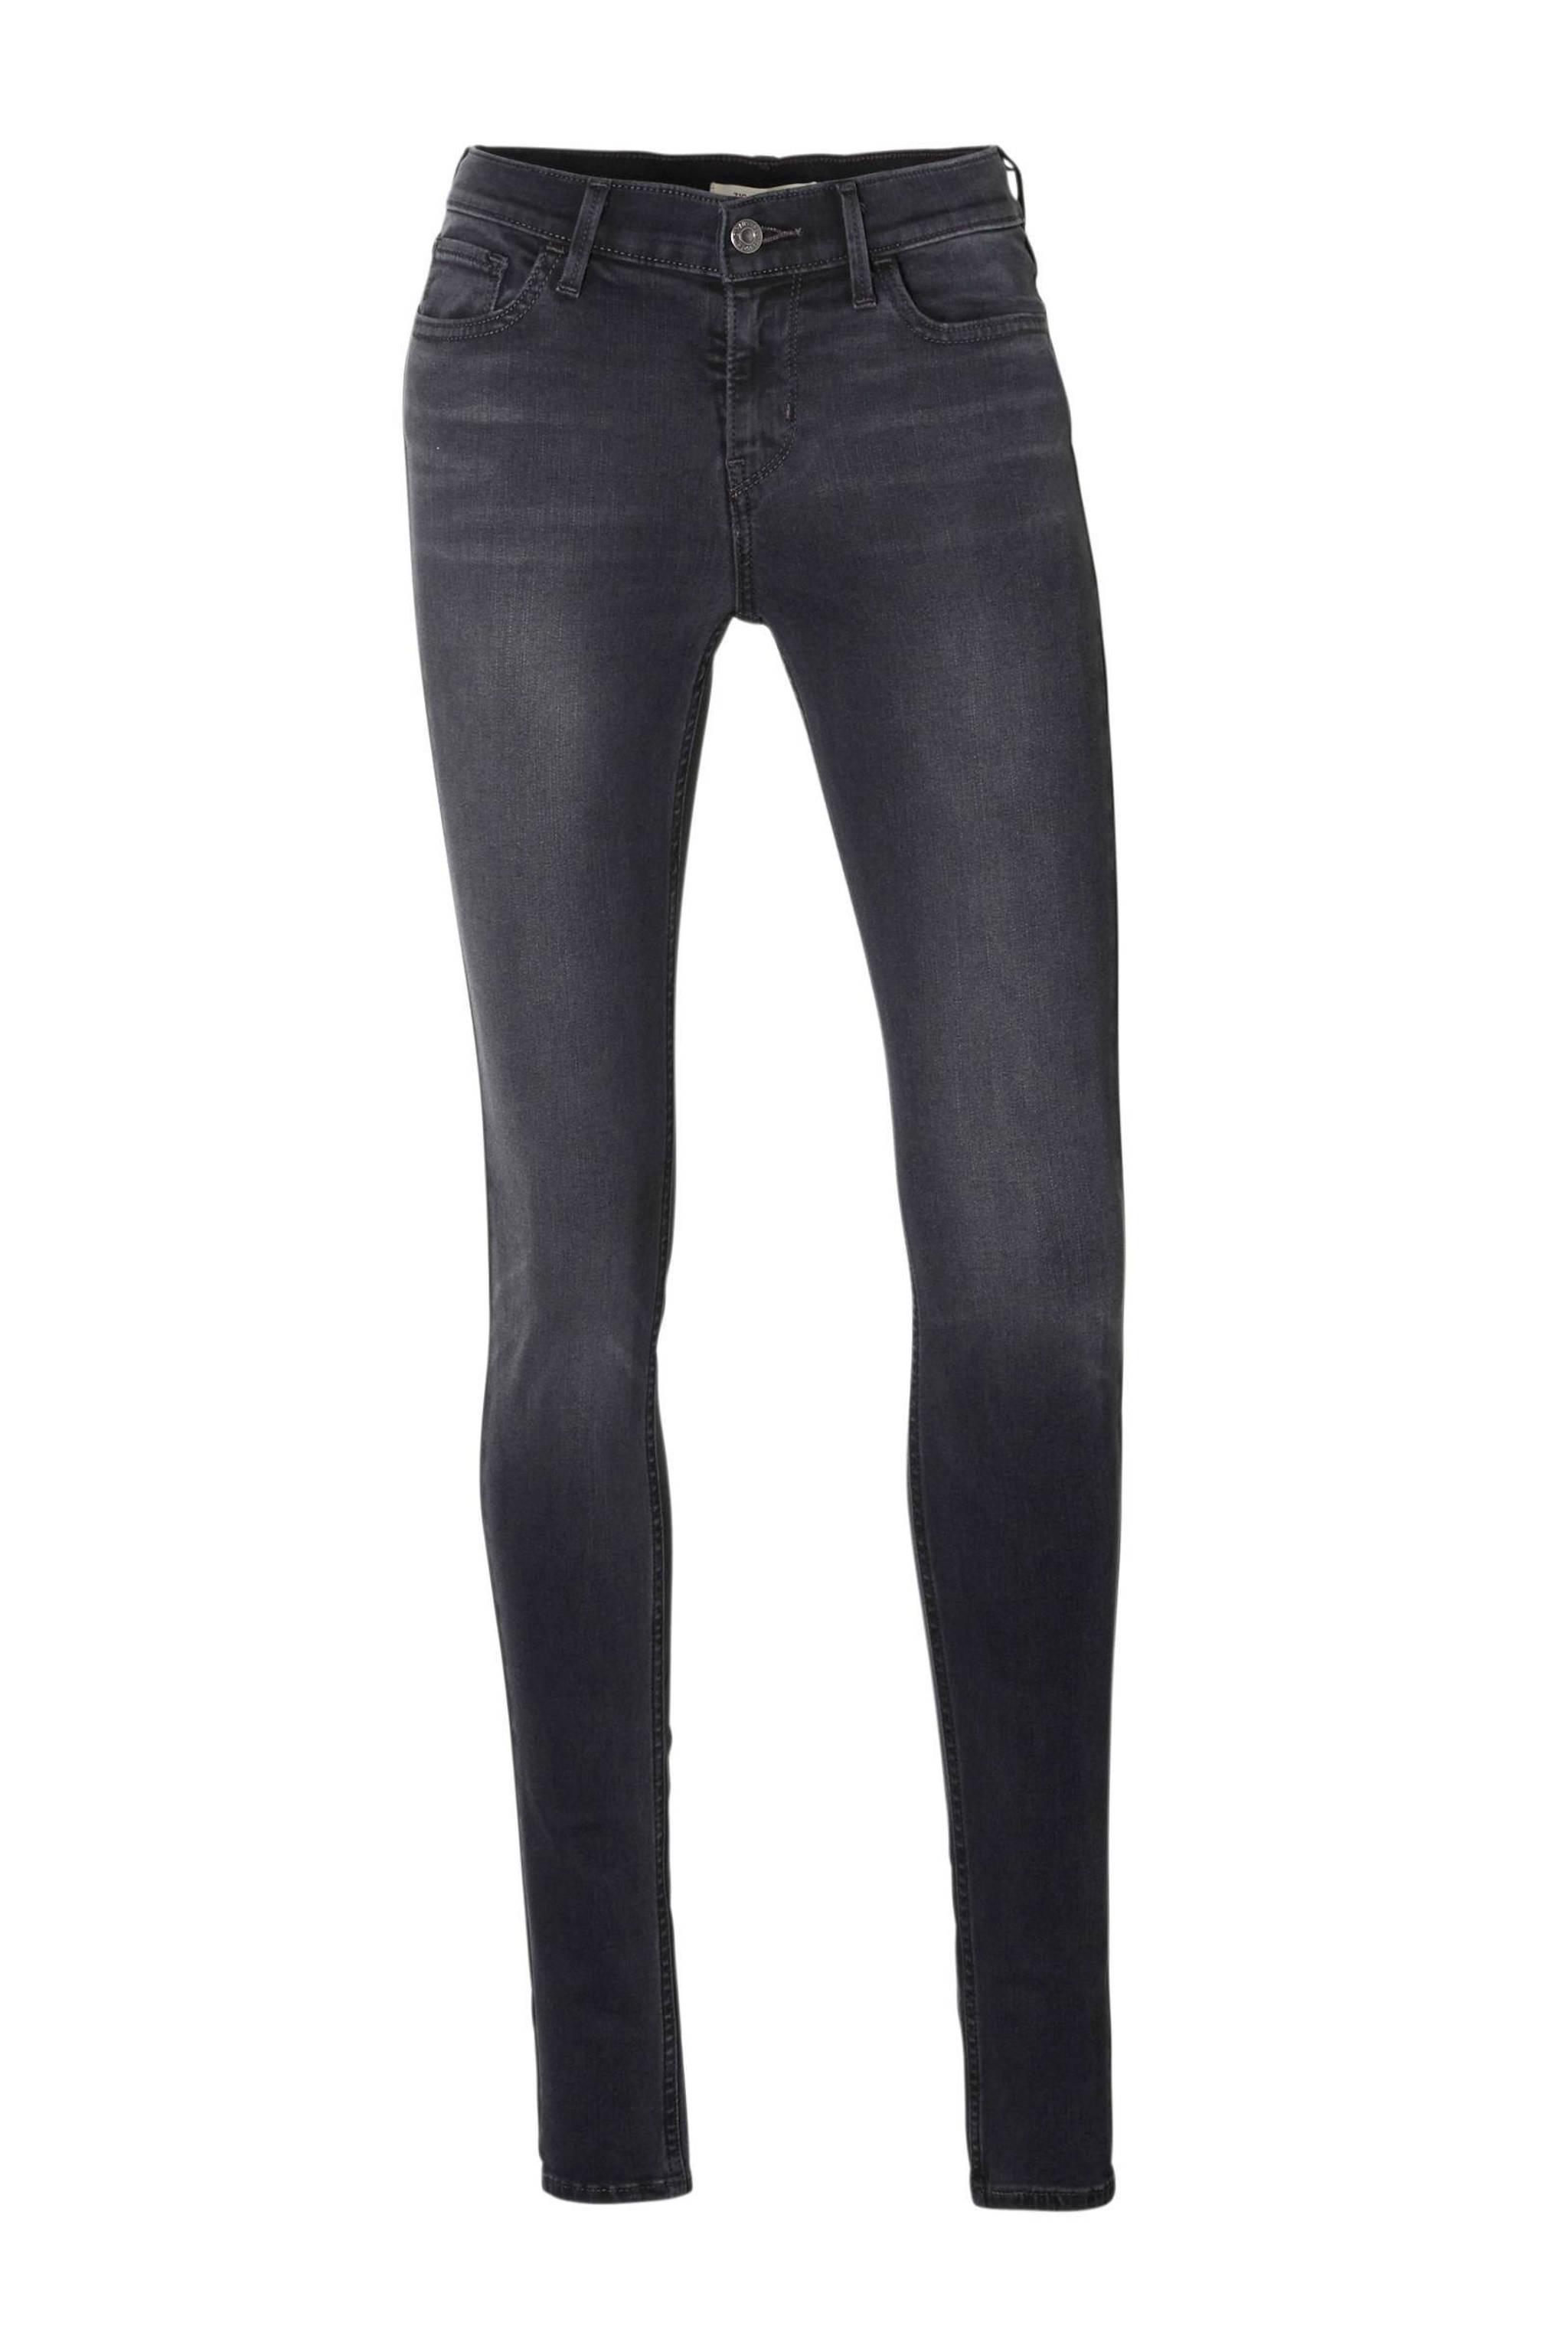 Levis 710 Innovation Super Skinny Jeans Wehkamp